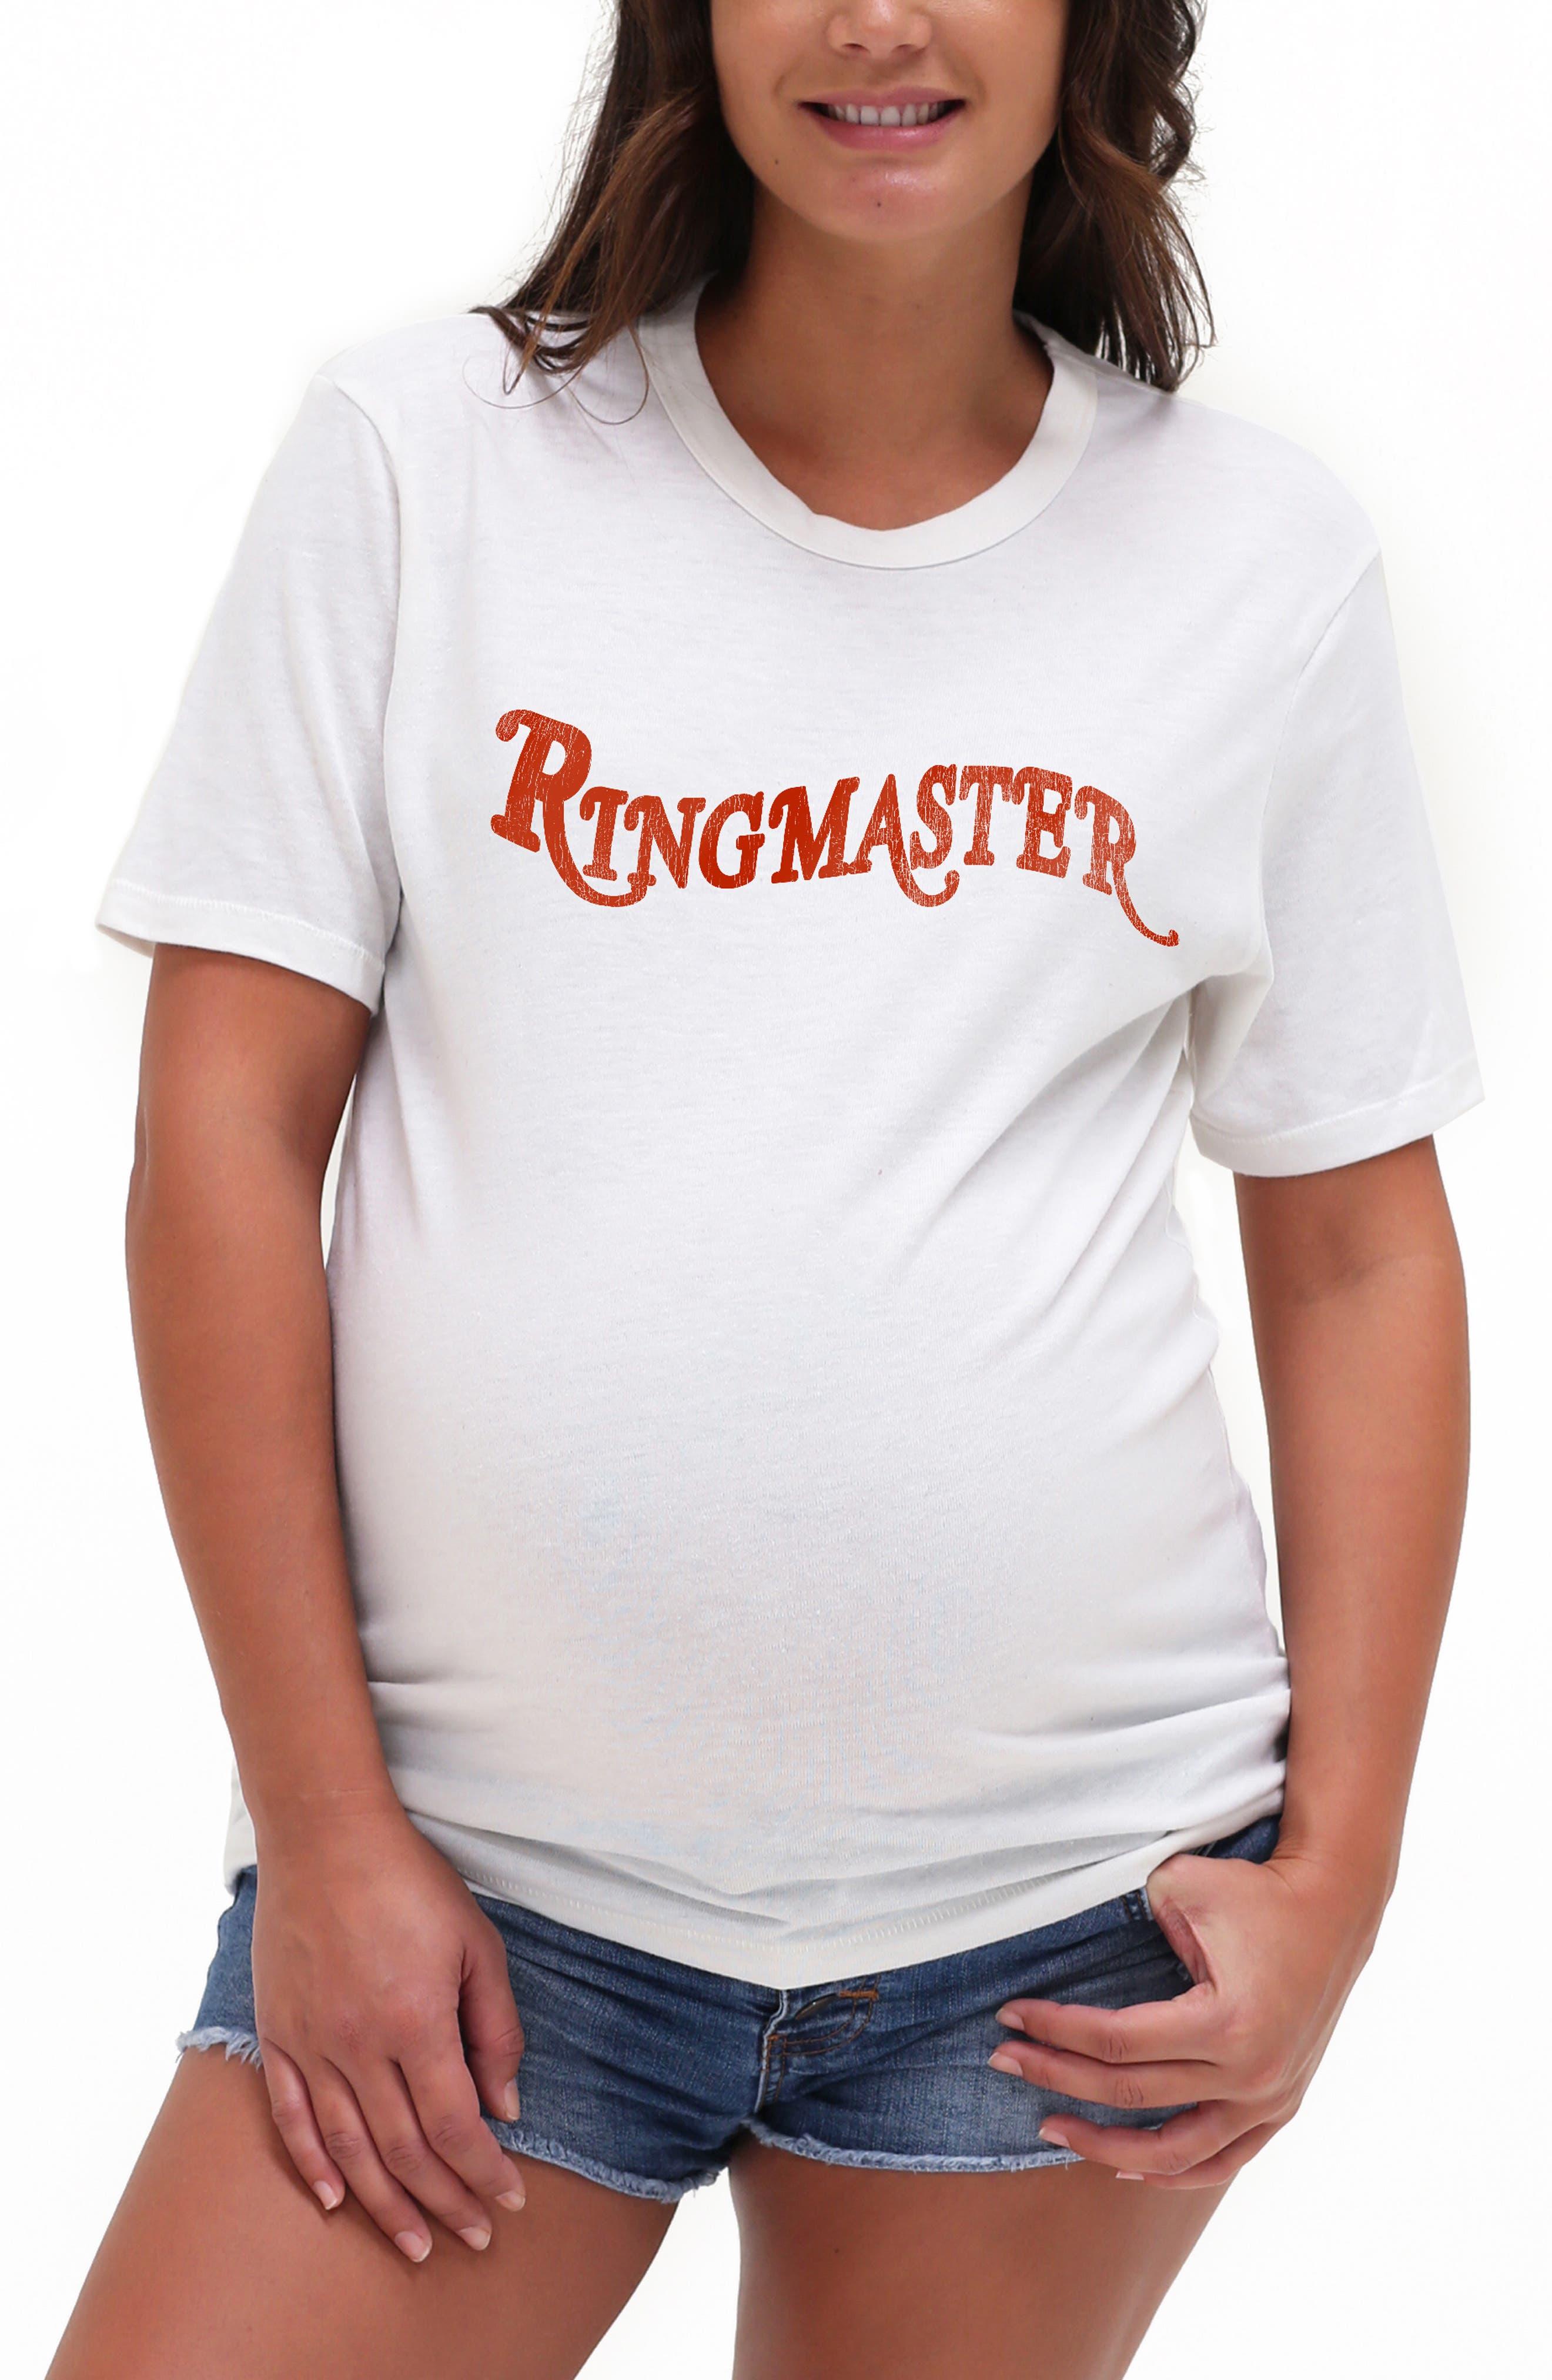 Ringmaster Maternity Graphic Tee